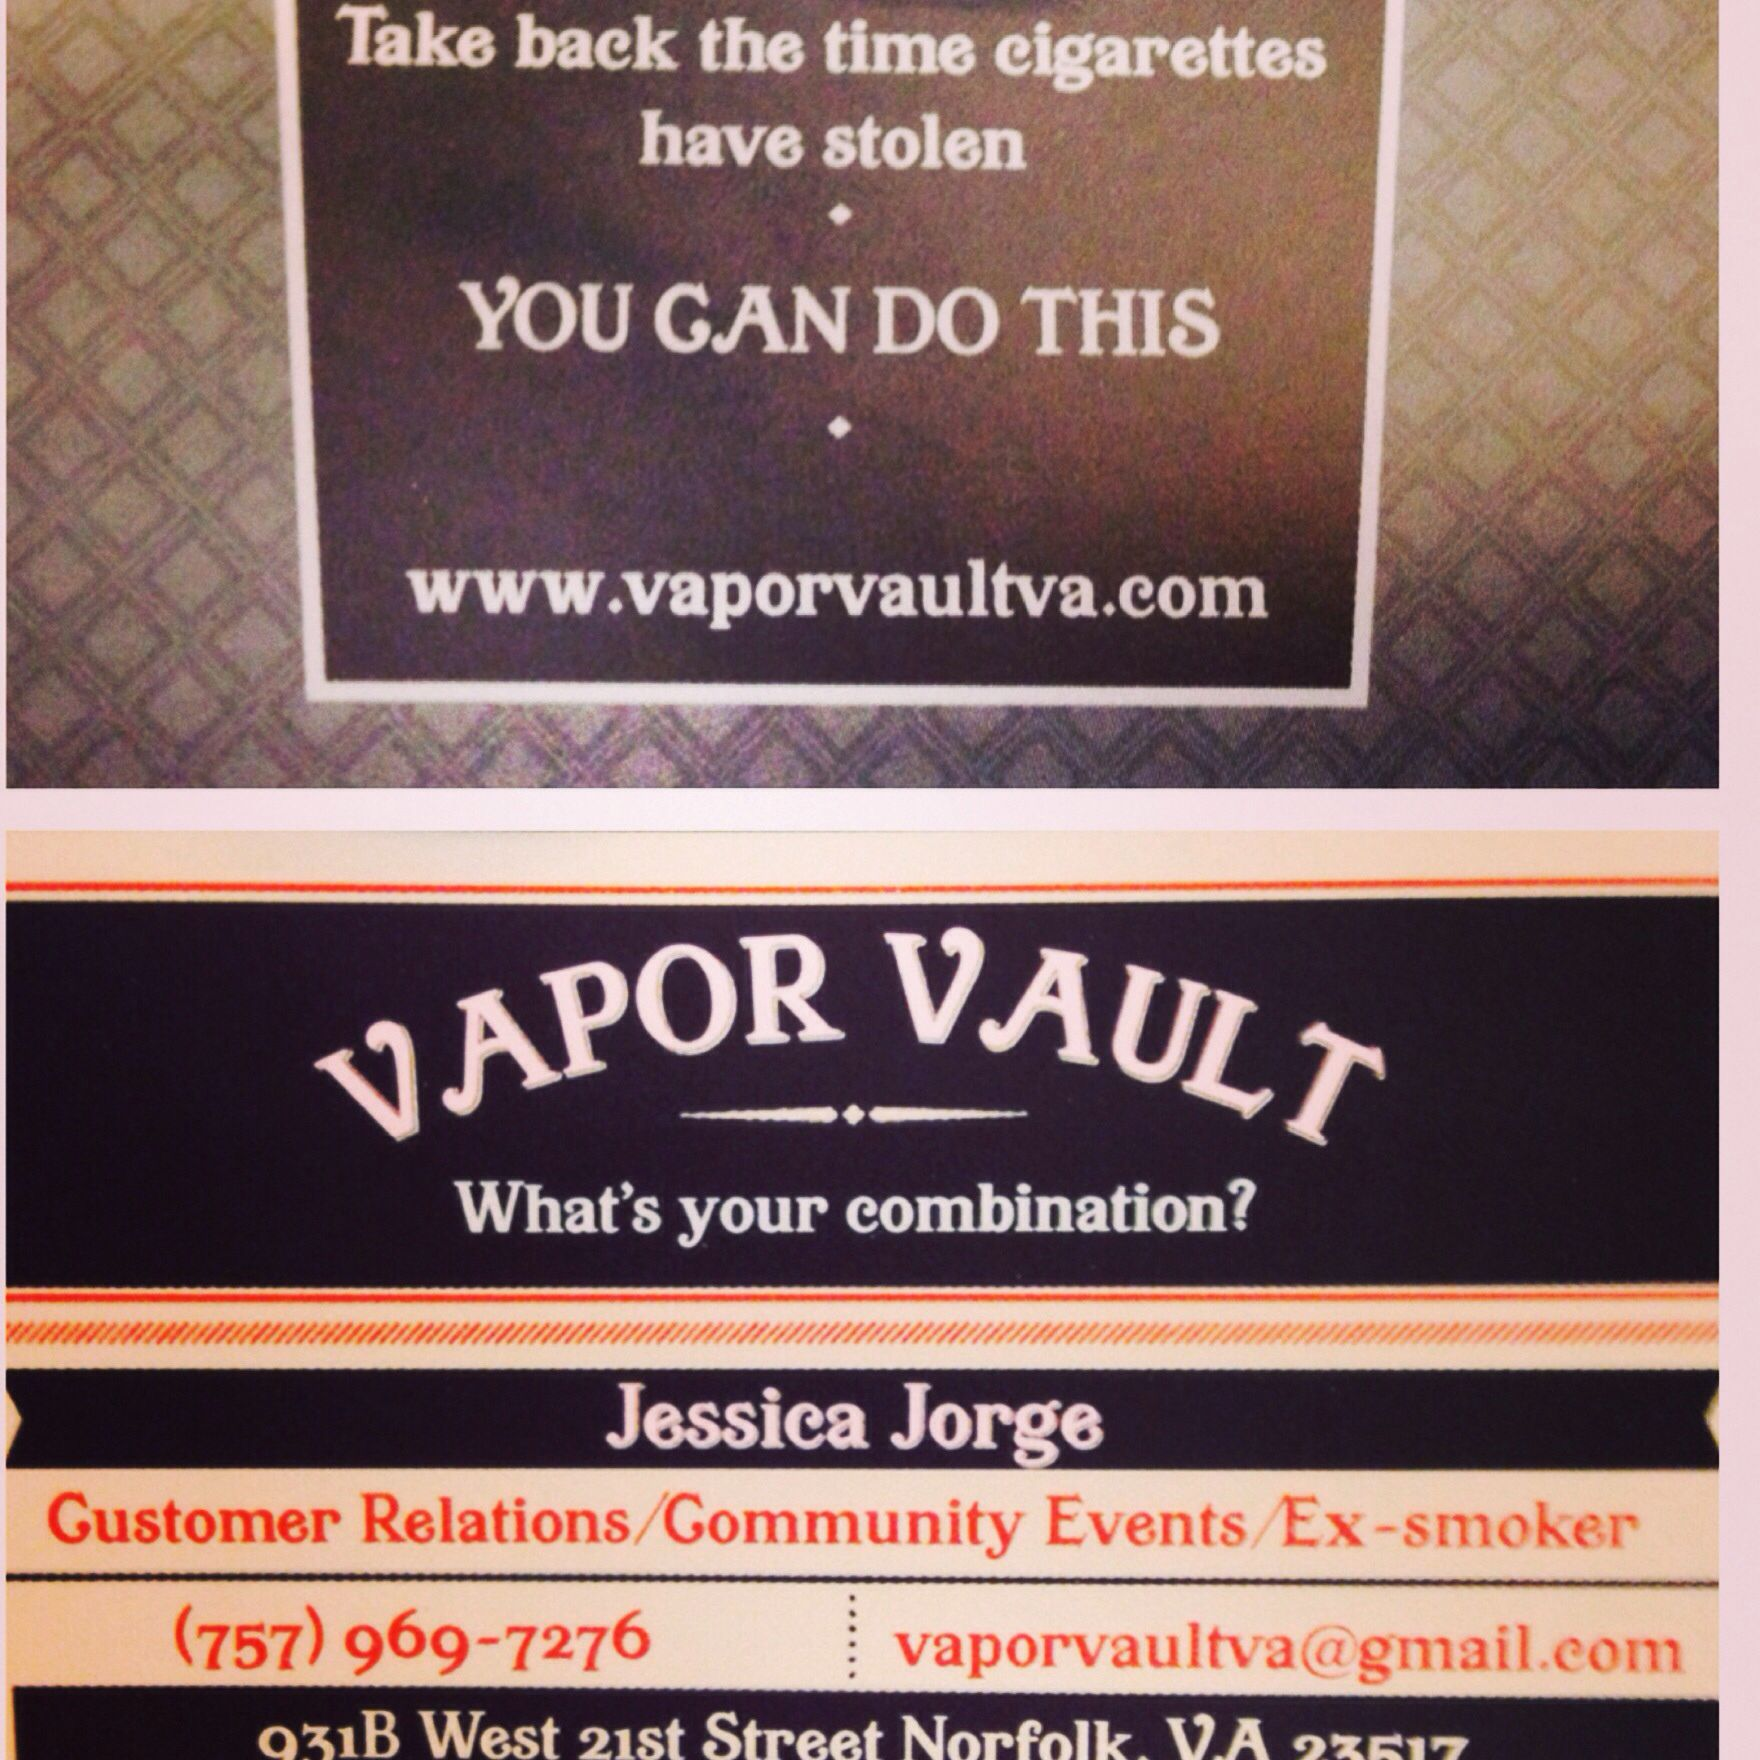 My new business cards came in vapor vault va vaporvaultva my new business cards came in vapor vault va vaporvaultva reheart Gallery